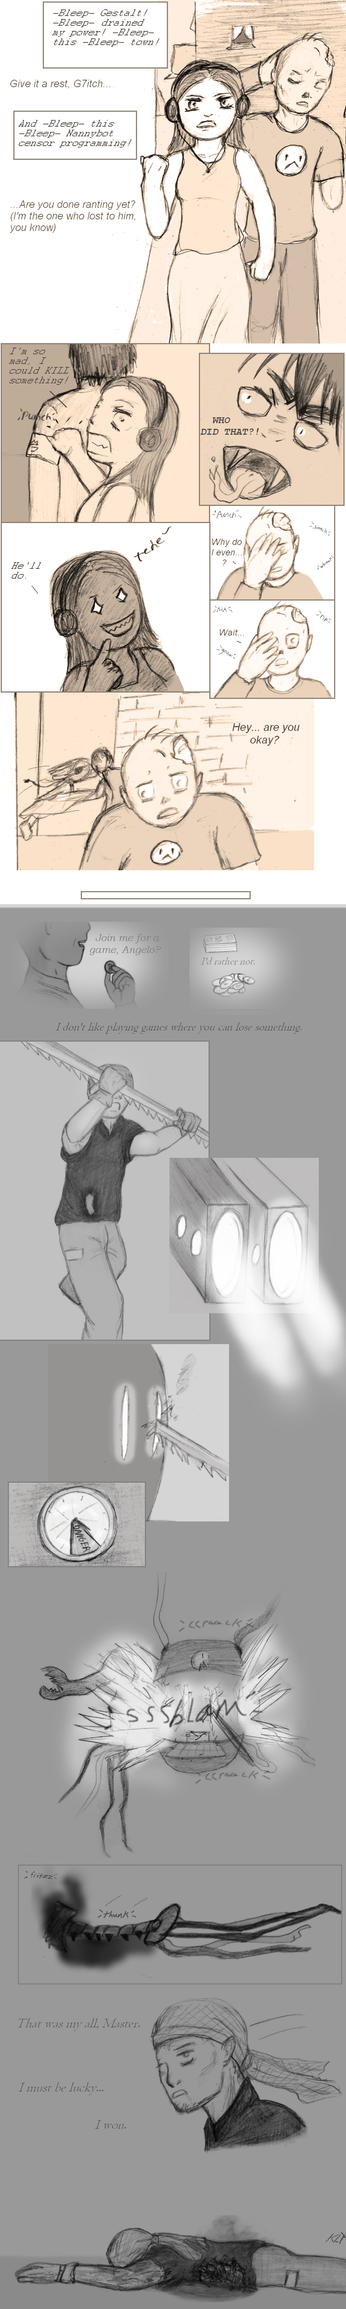 NT FINAL pg 9 by stickfigureparadise